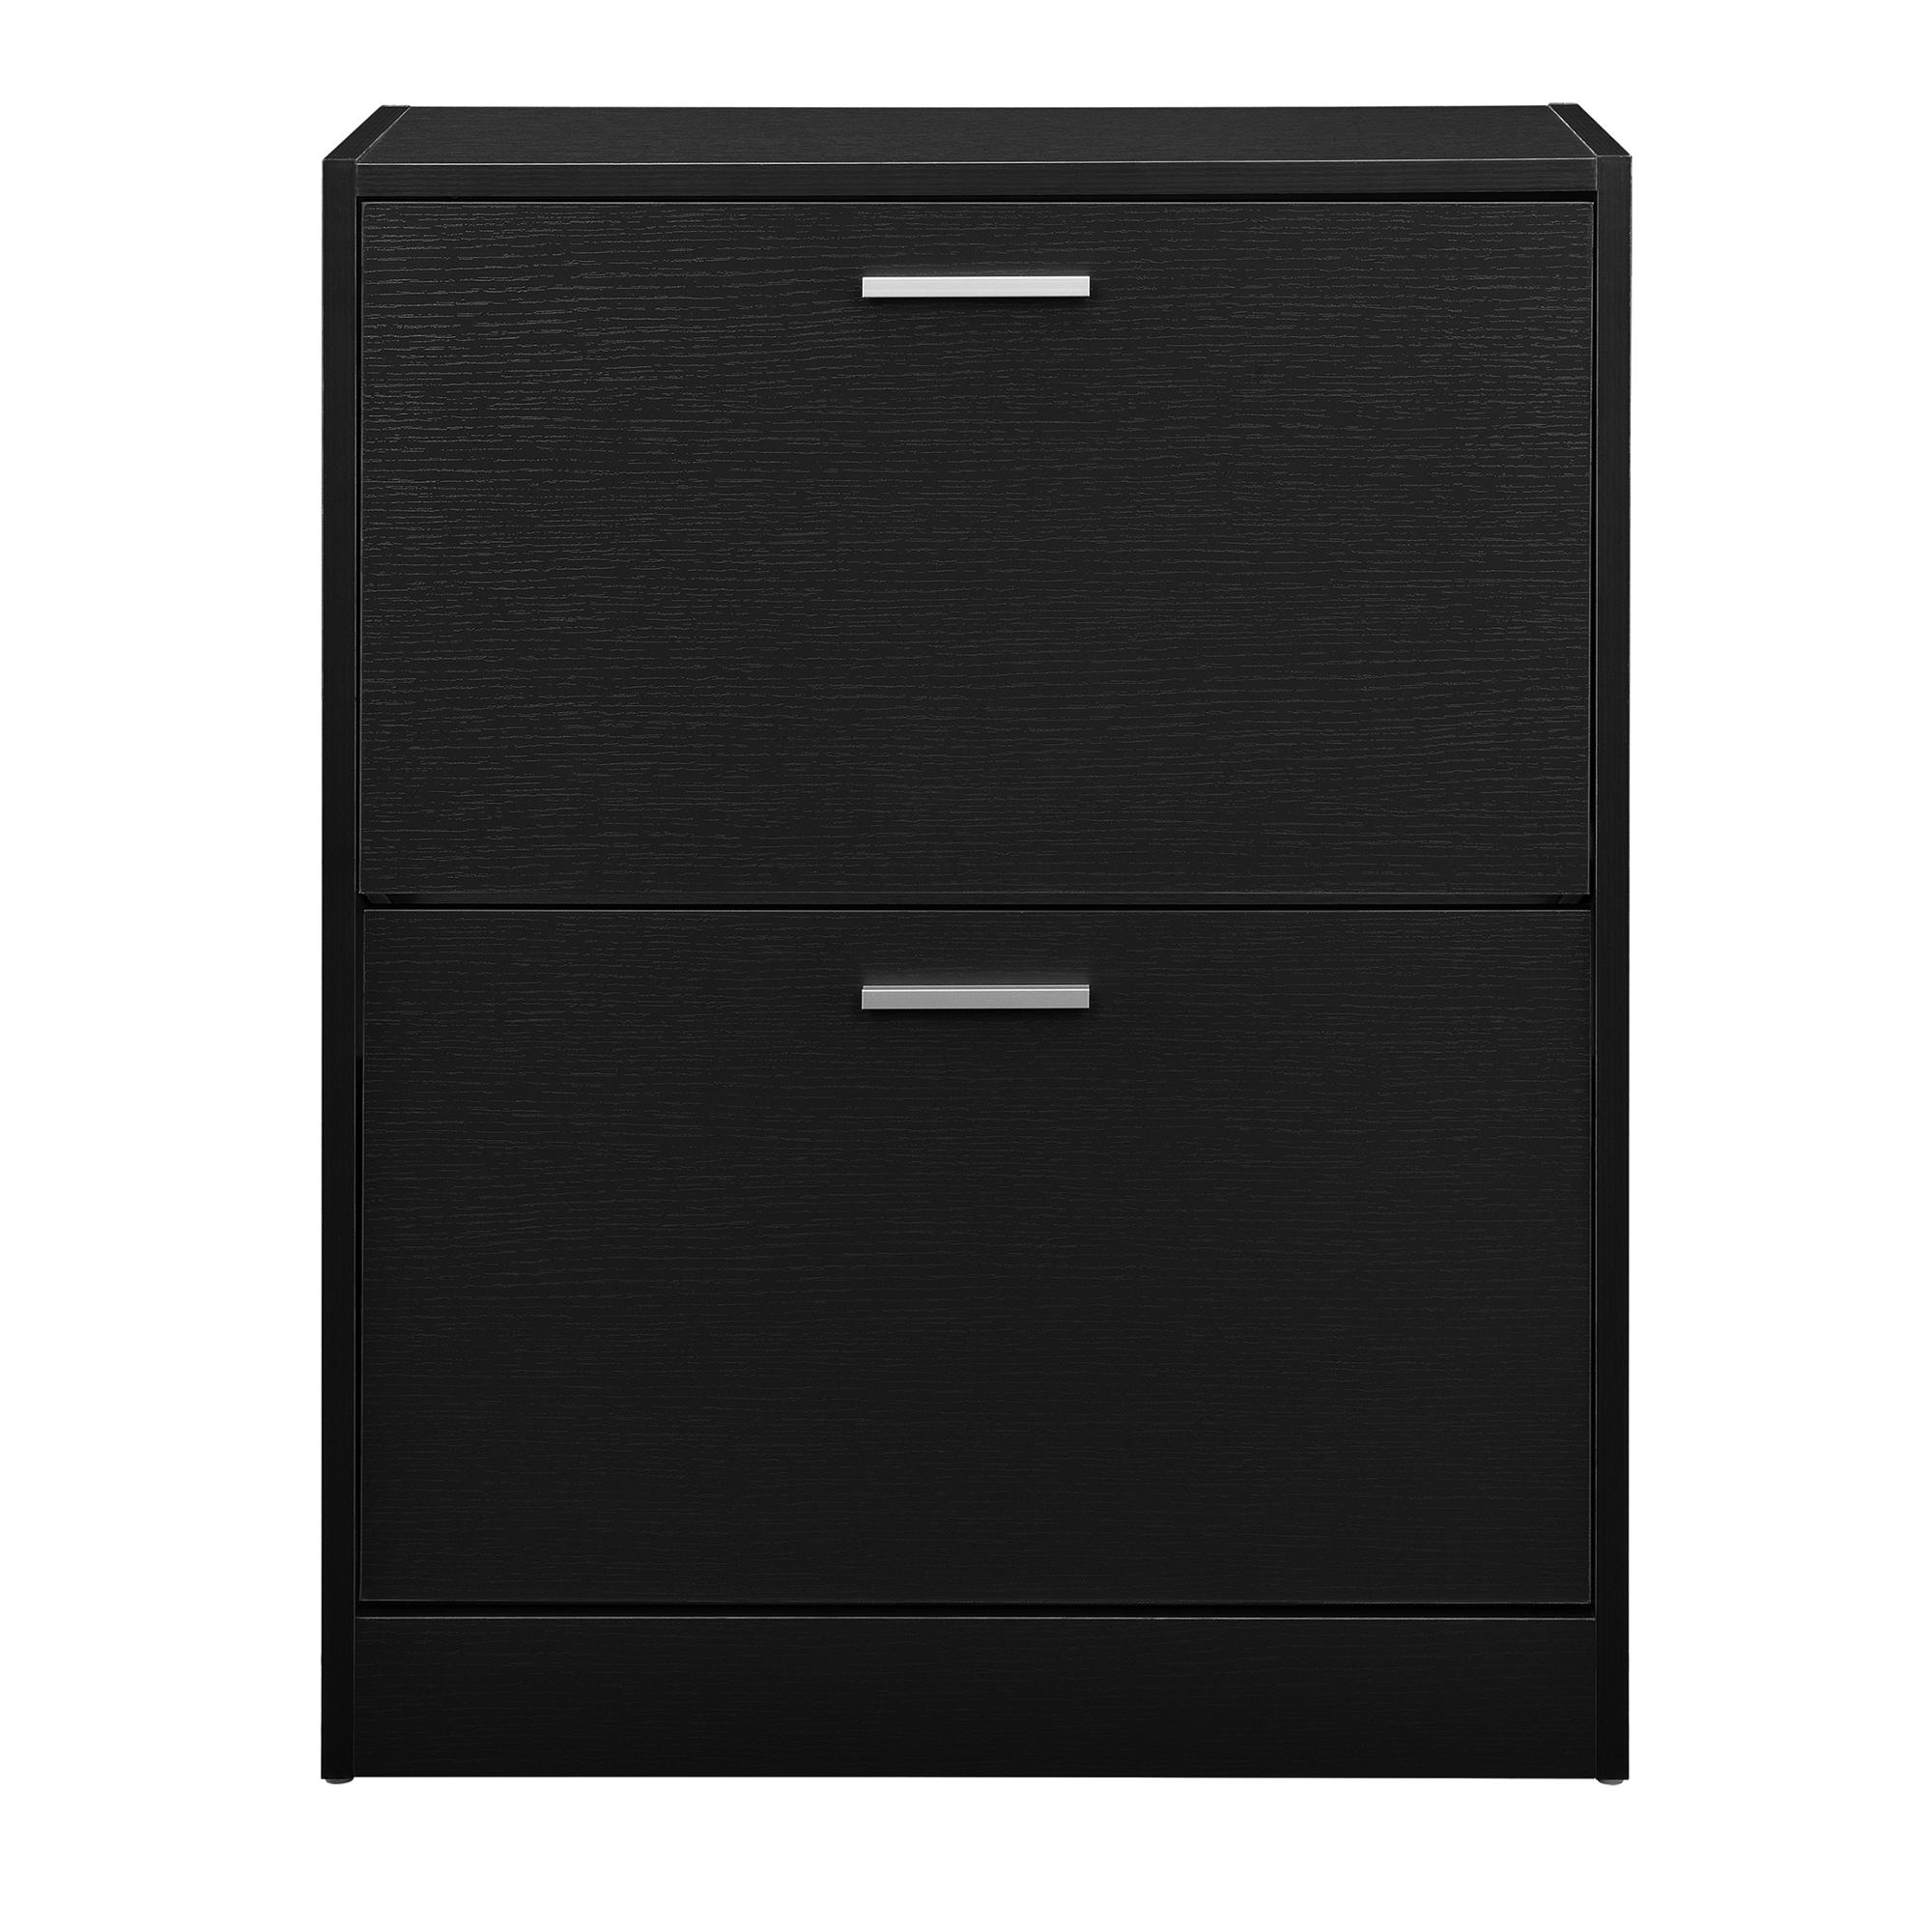 schuhschrank schuhkipper schuhregal schrank. Black Bedroom Furniture Sets. Home Design Ideas